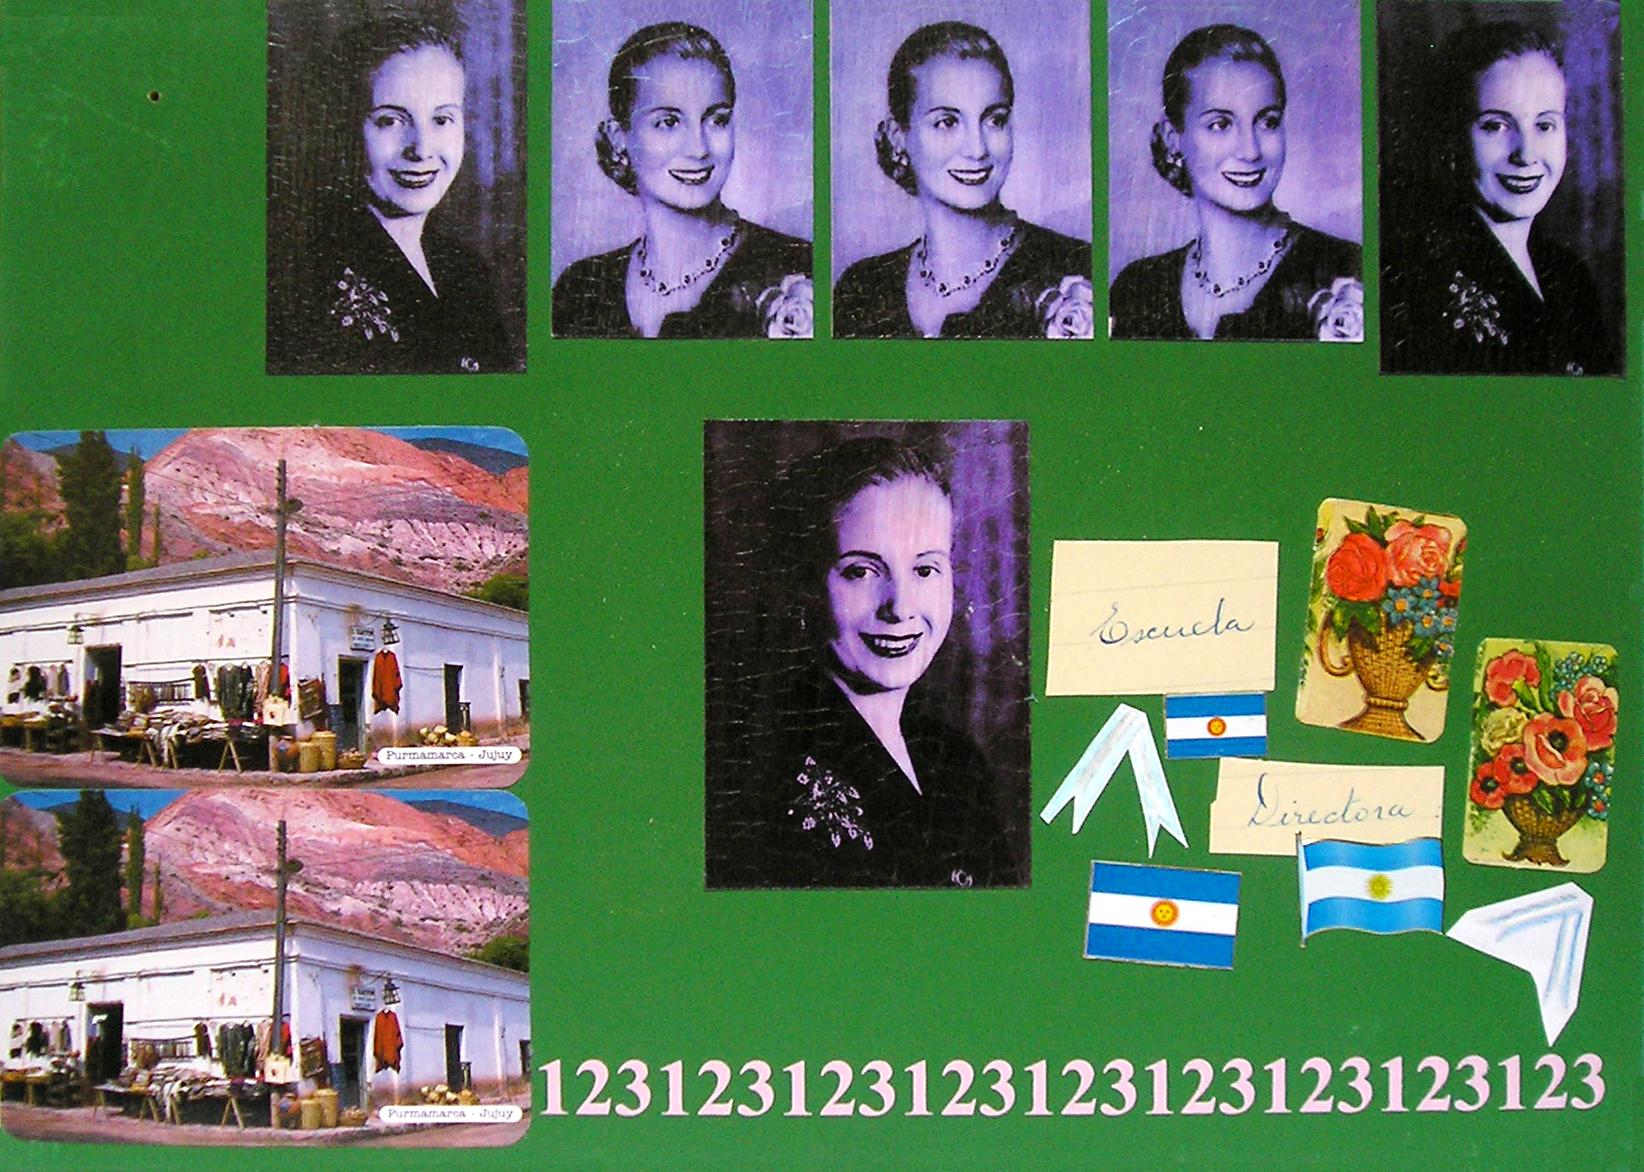 Evita Maestra recorre el país, Jujuy; serie, técnica mixta sobre pizarrón; 21 x 30 cm, 2007